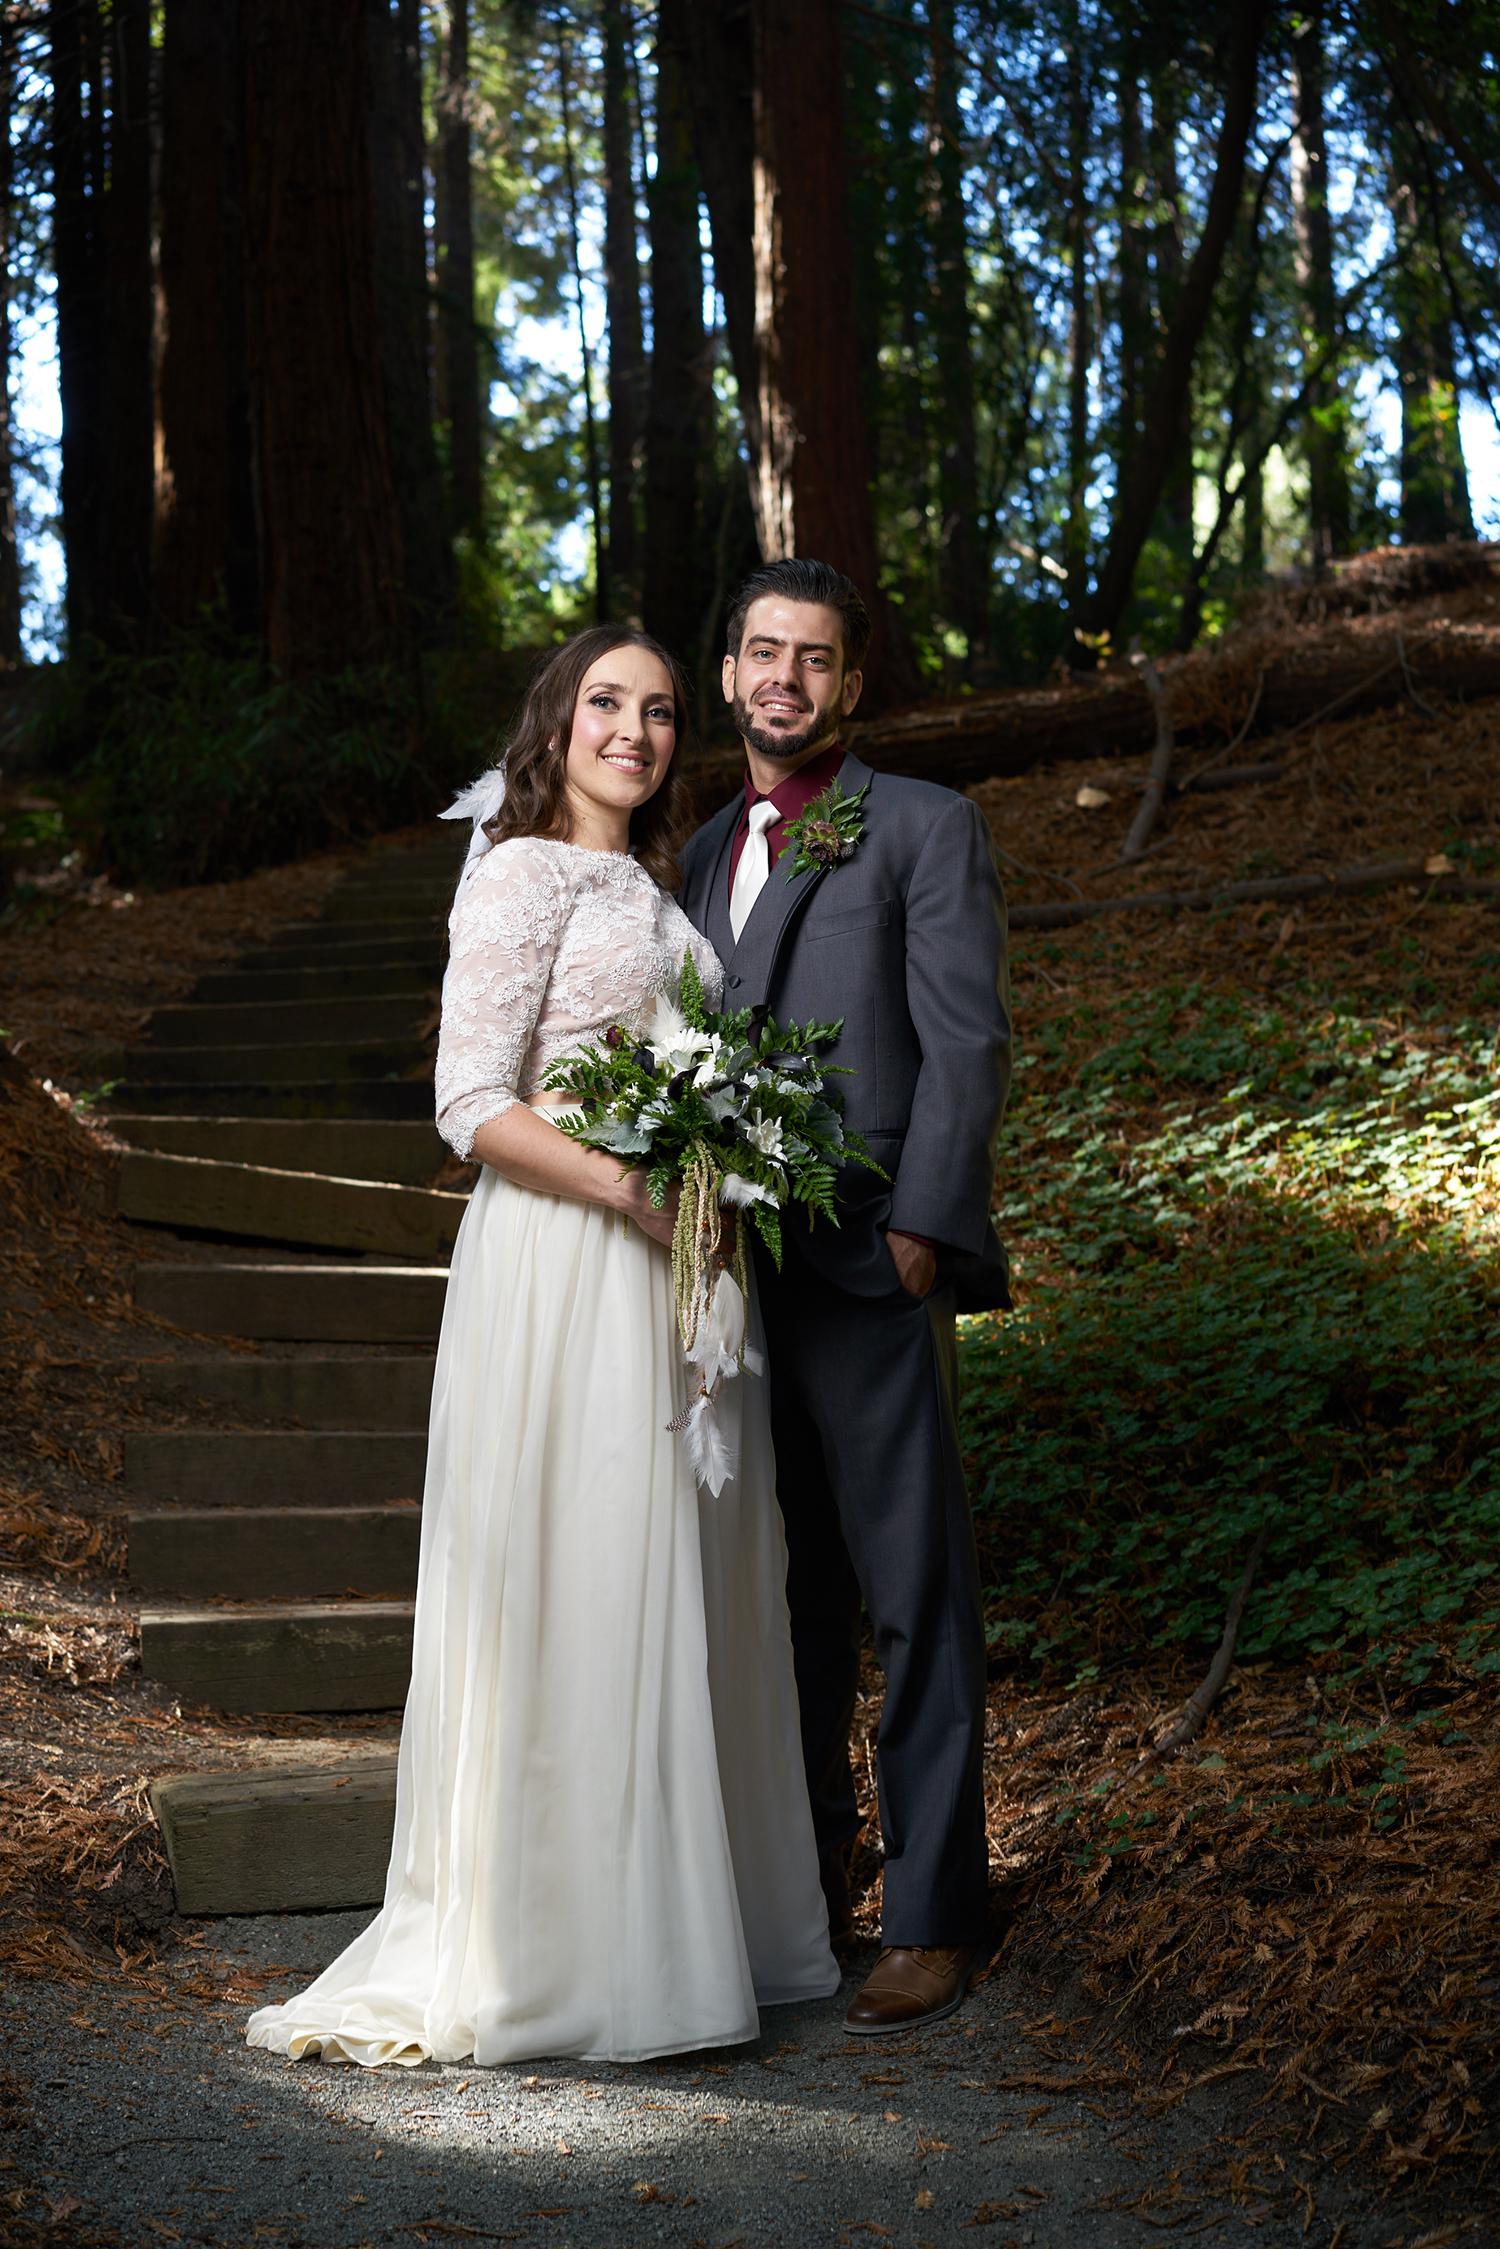 100717_Lenora_Jesse0370-weddingdress-bride-weddingphotography-best-weddingphotographer-bridal-groom-wedding-engagementring-proposal-brides-diamondring-sonyalpha-sony-sonya7rii-sanfrancisco-sf-bayarea-photographer-profoto-berkeley-botanical-garden.jpg